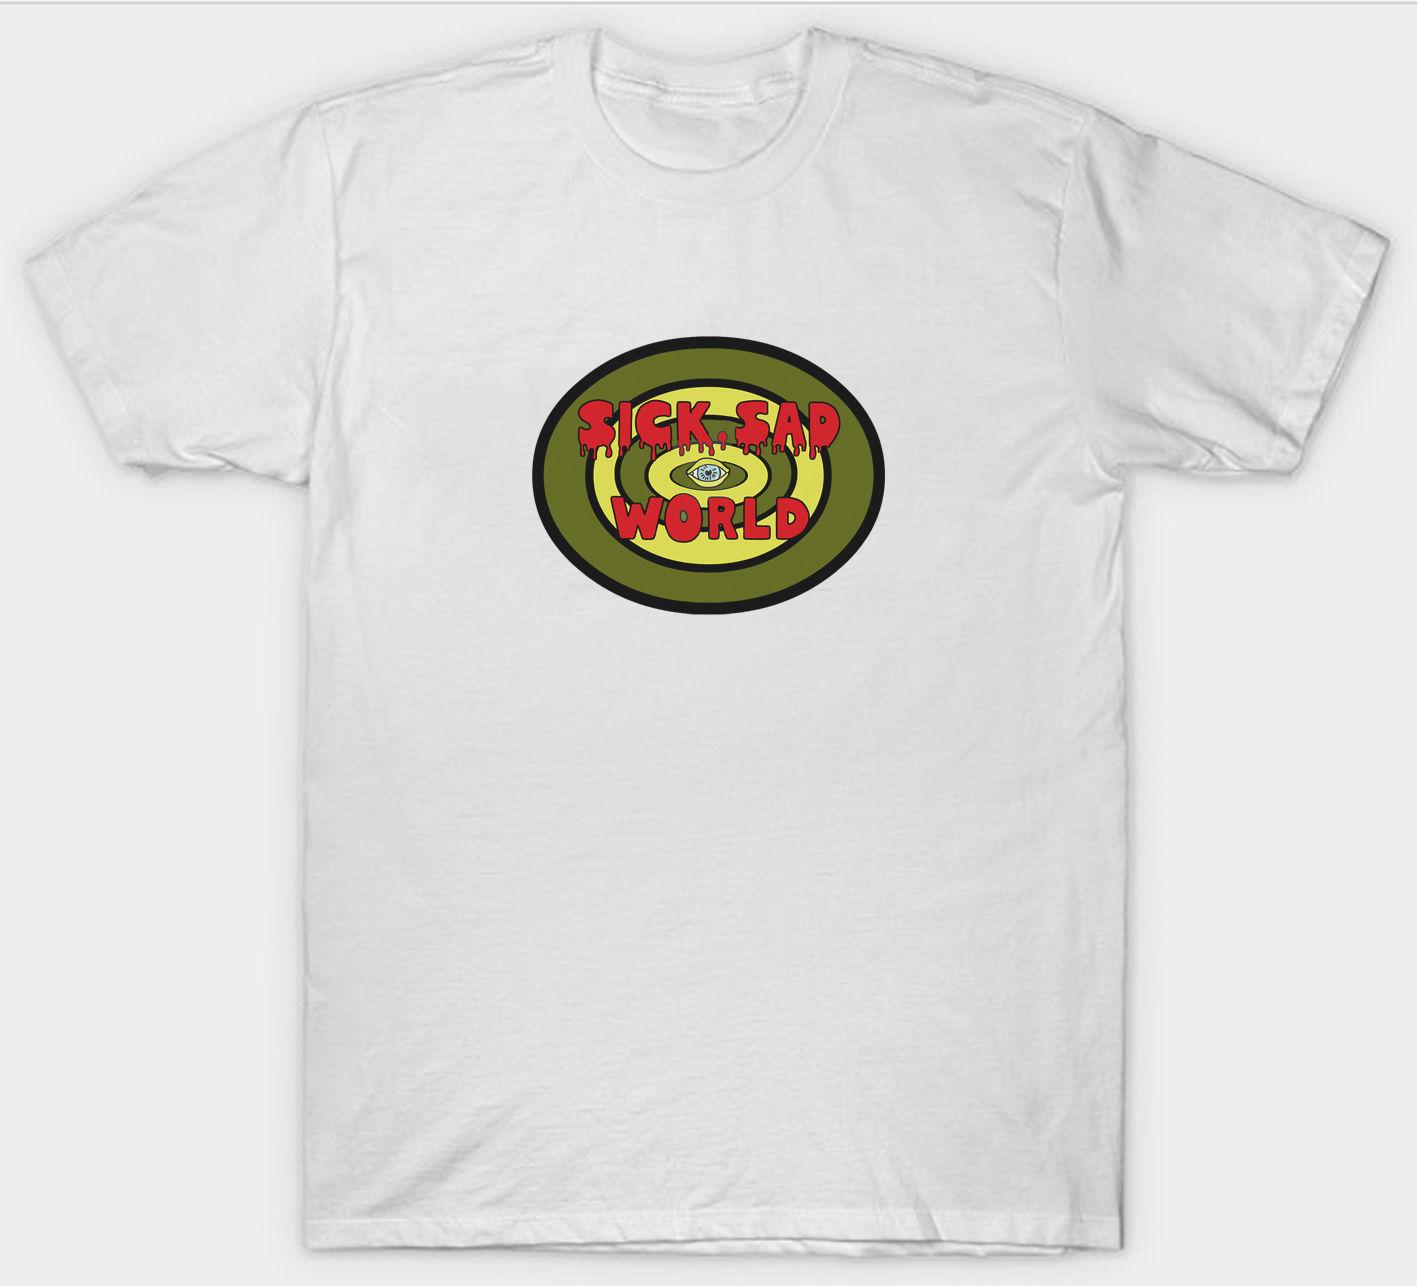 DARIA T SHIRT SICK SAD WORLD TV SERIES RETRO BIRTHDAY GIFT Casual T-Shirt Male Short Sleeve Pattern Hipster Personality